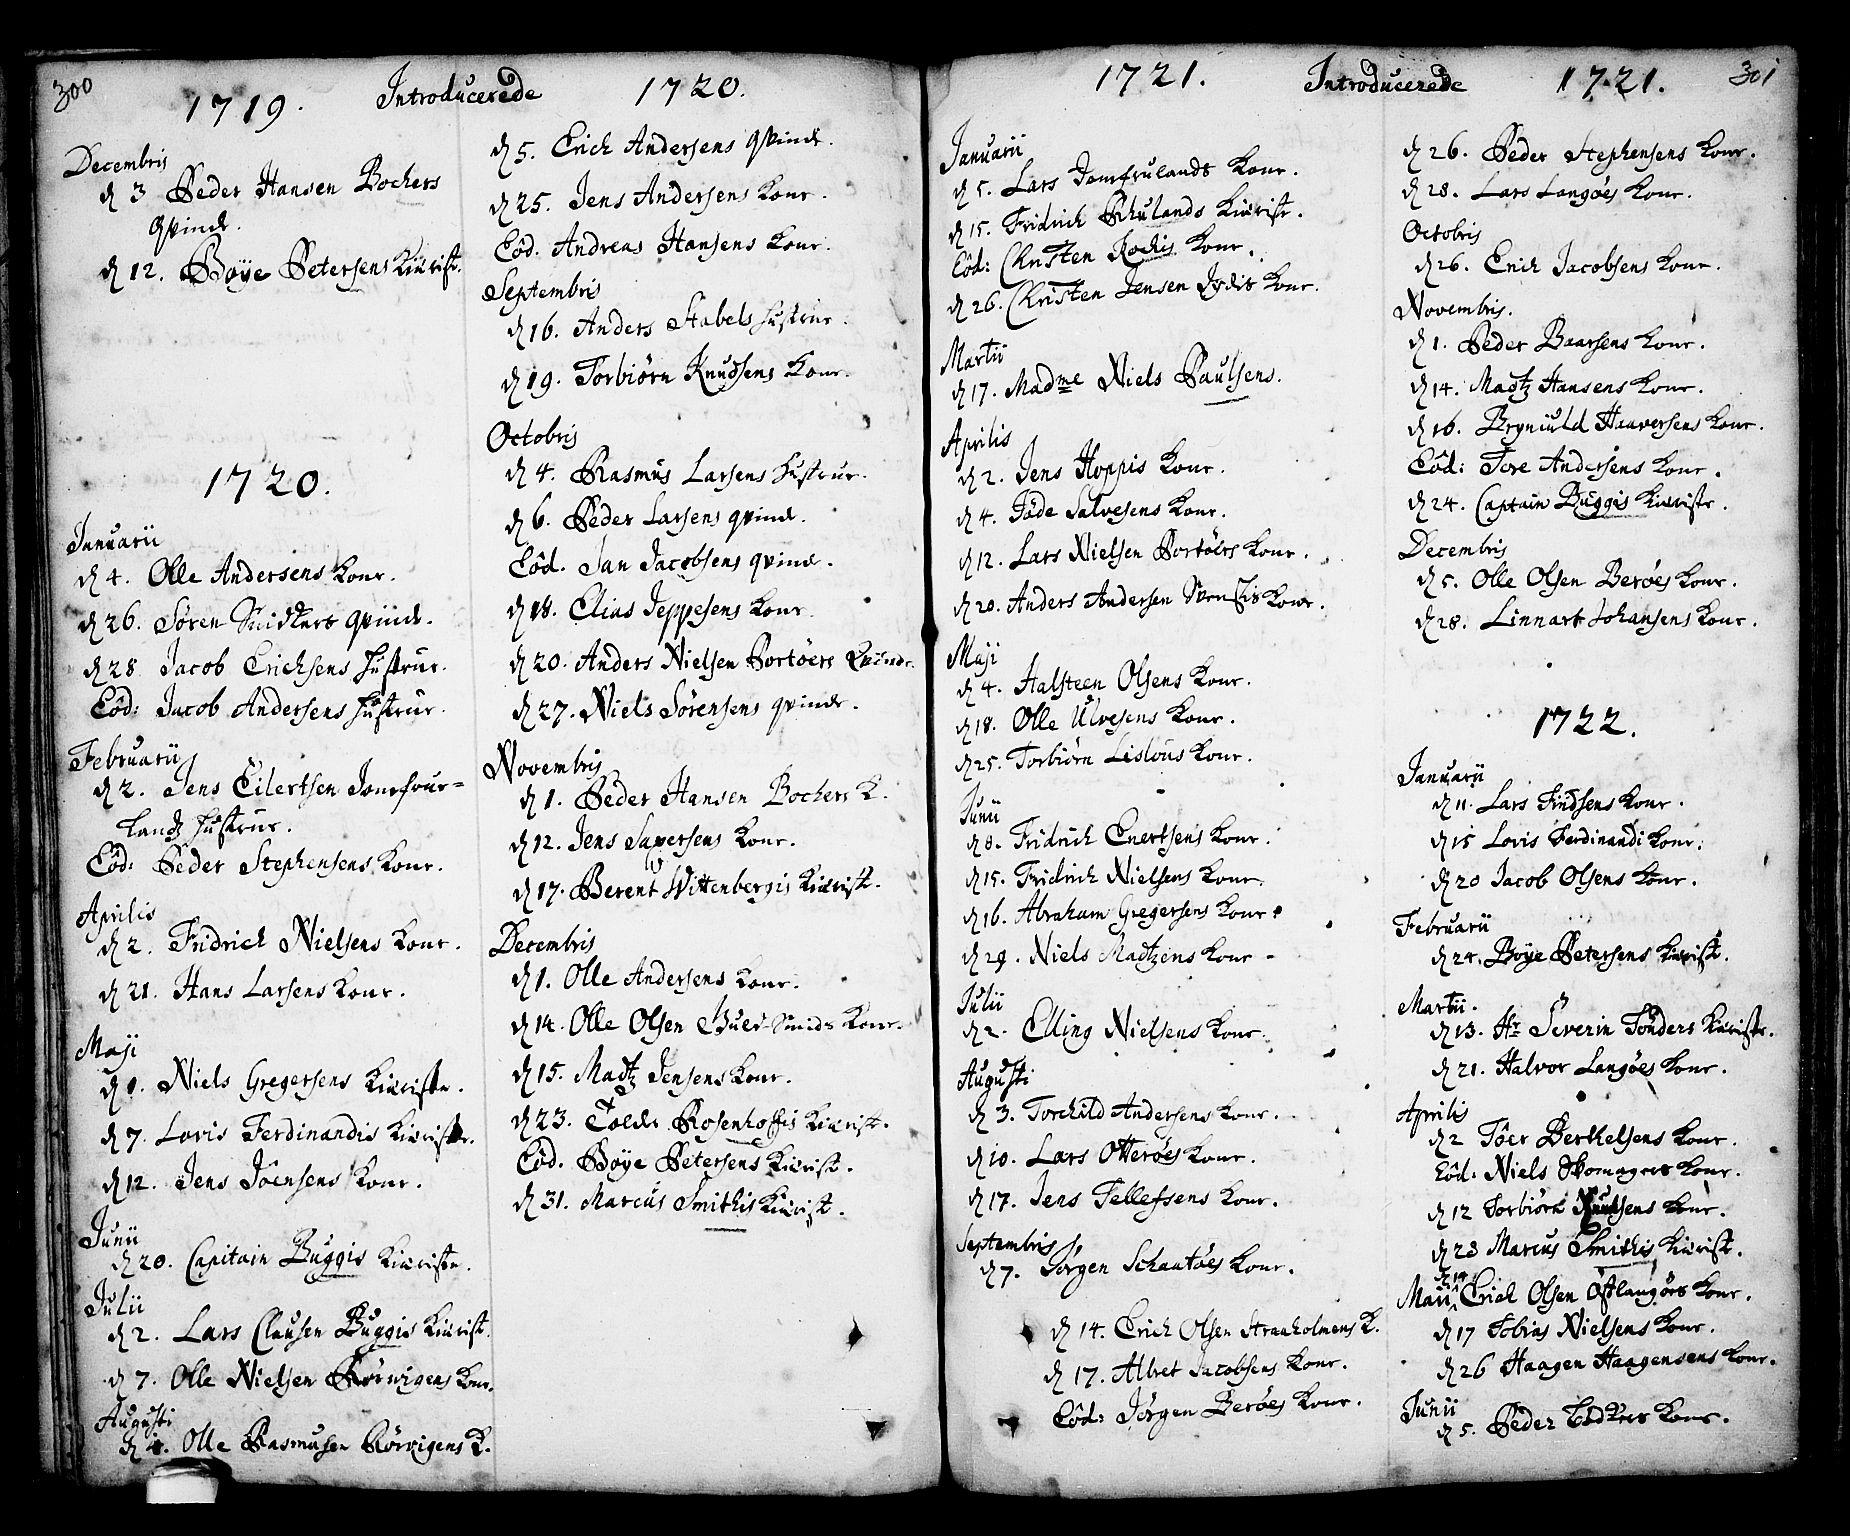 SAKO, Kragerø kirkebøker, F/Fa/L0001: Ministerialbok nr. 1, 1702-1766, s. 300-301